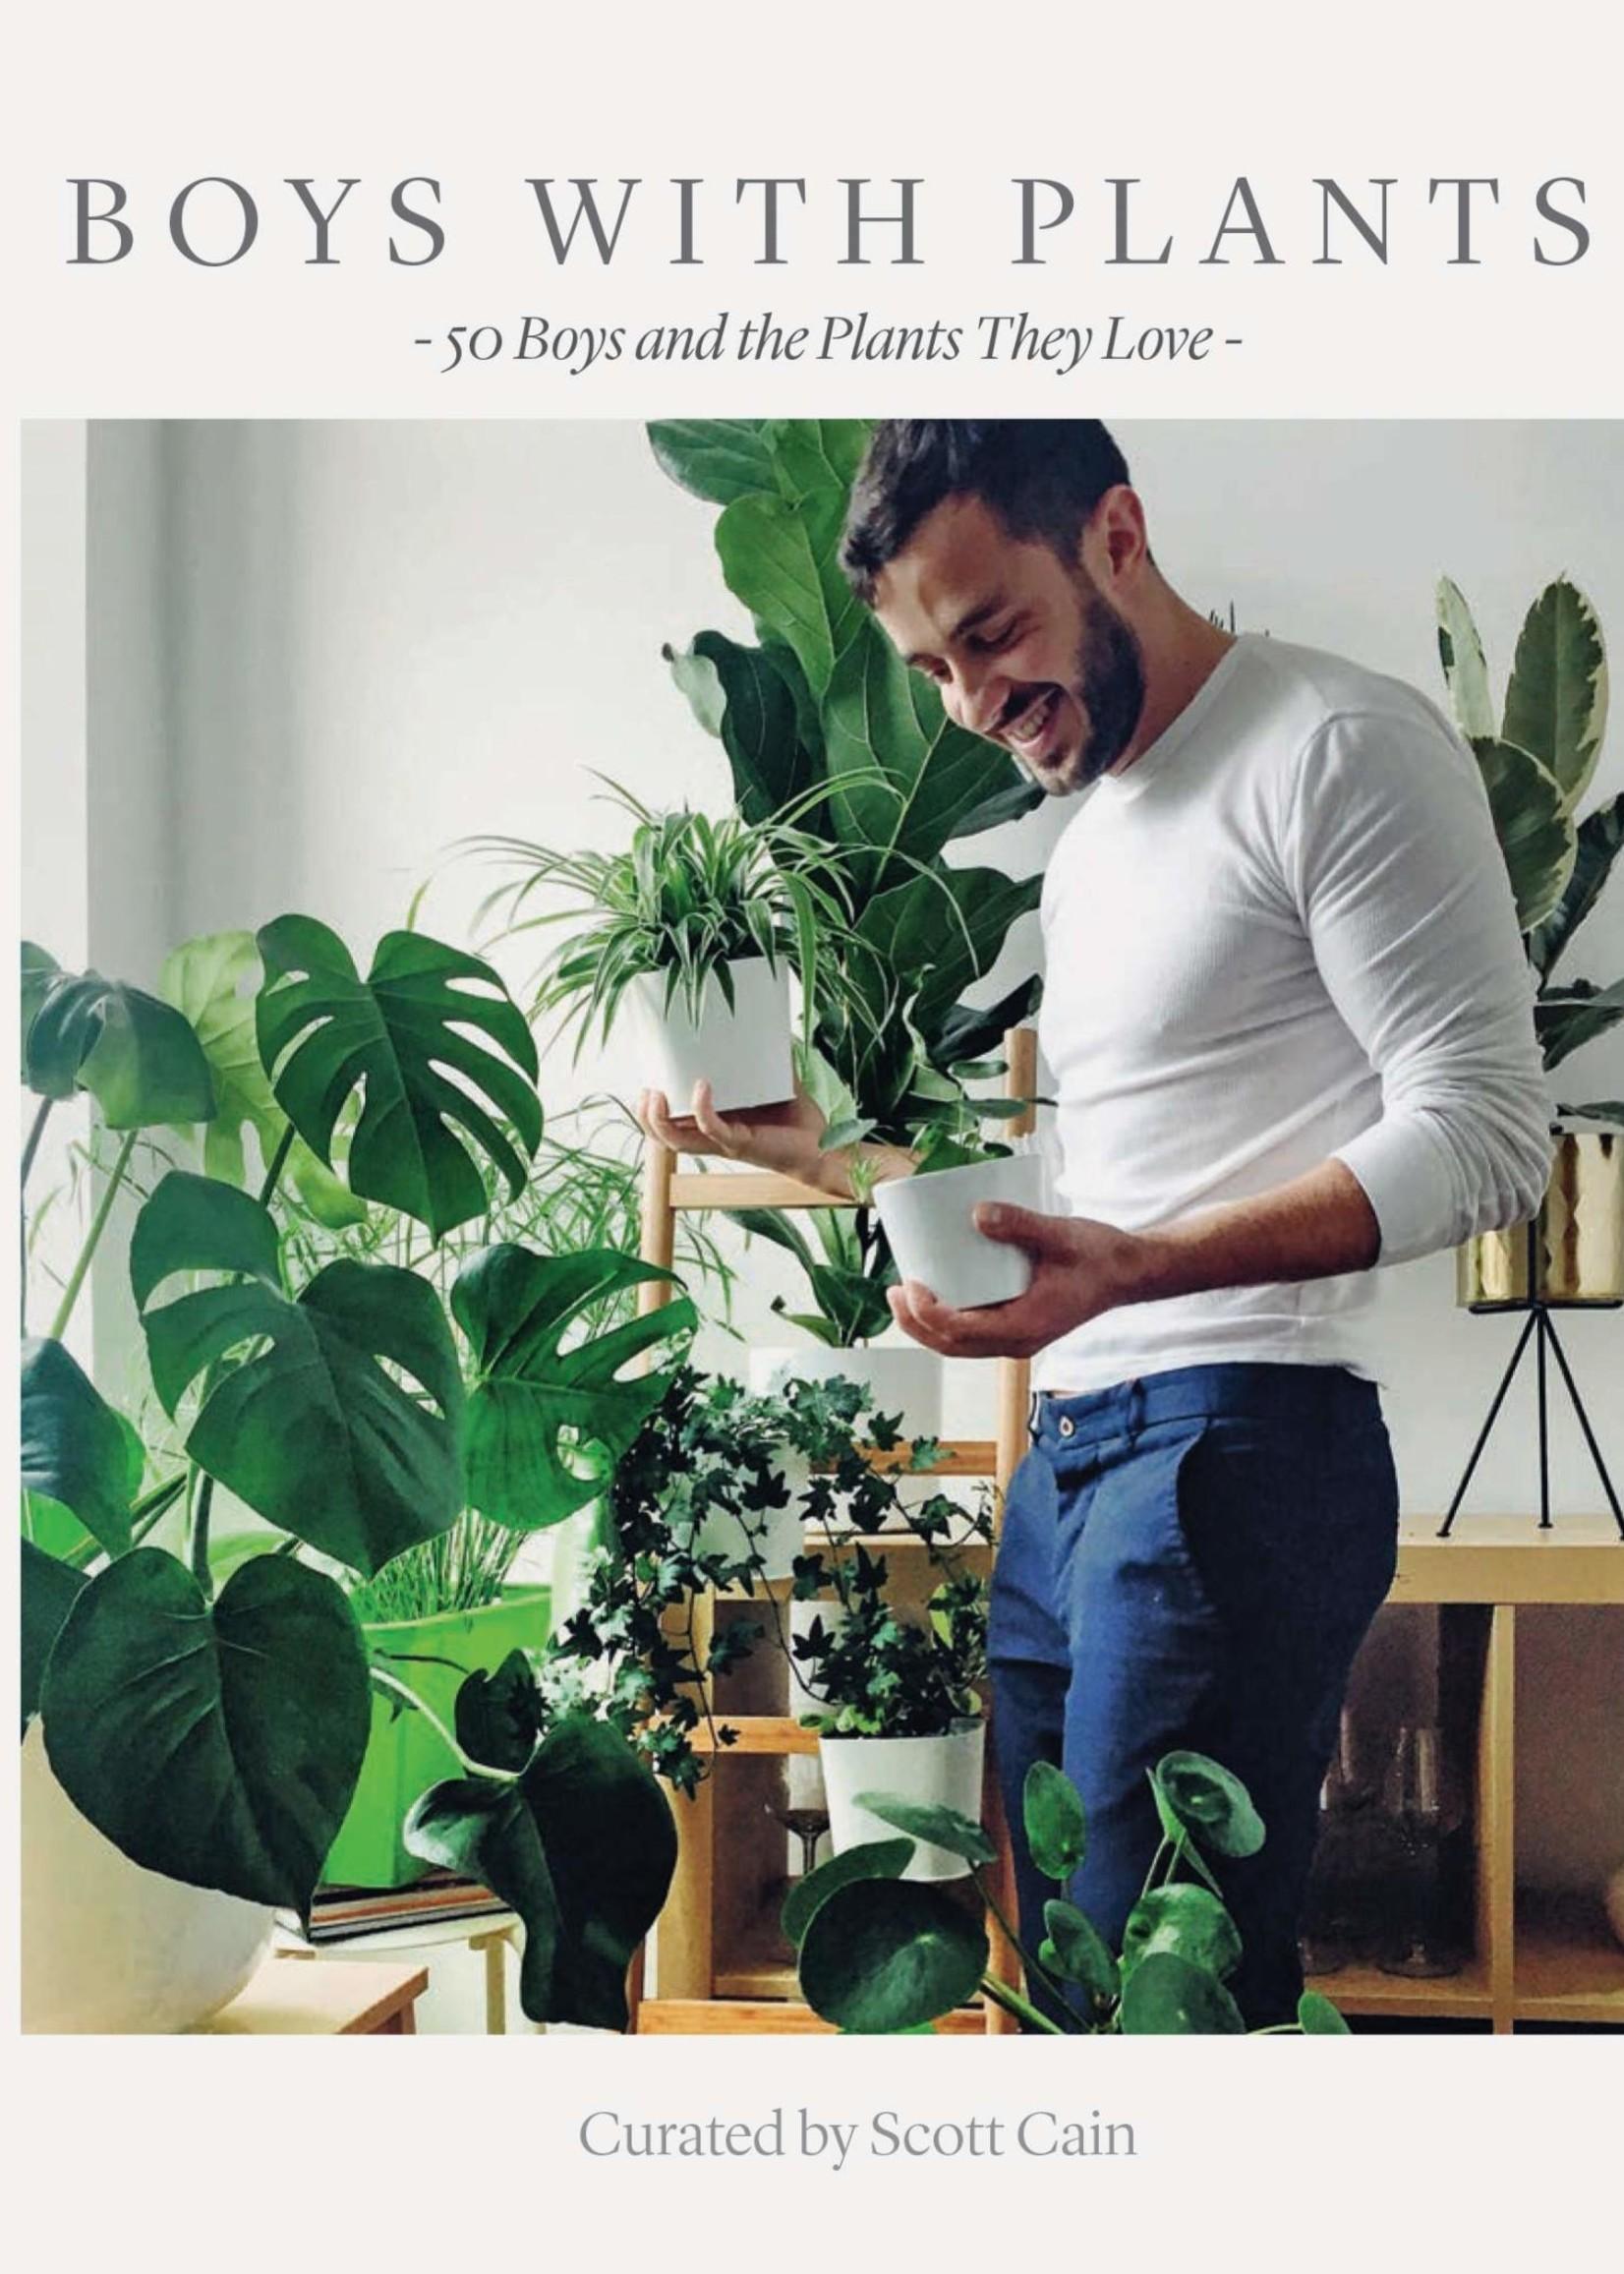 HACHETTE BOYS WITH PLANTS BOOK